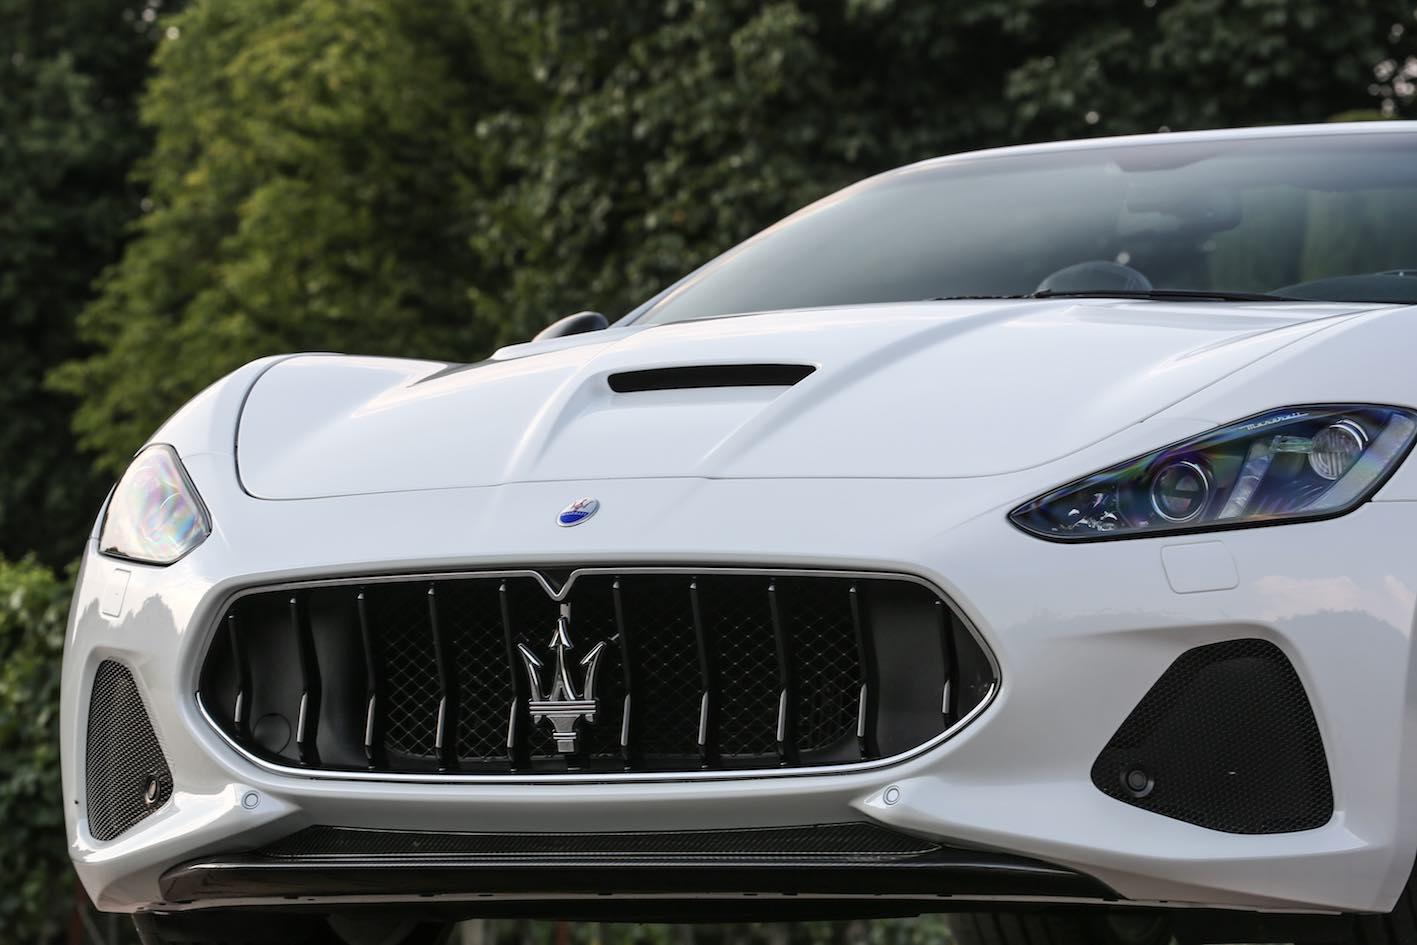 Maserati GranCabrio MC 2018 weiß Kühlergrill